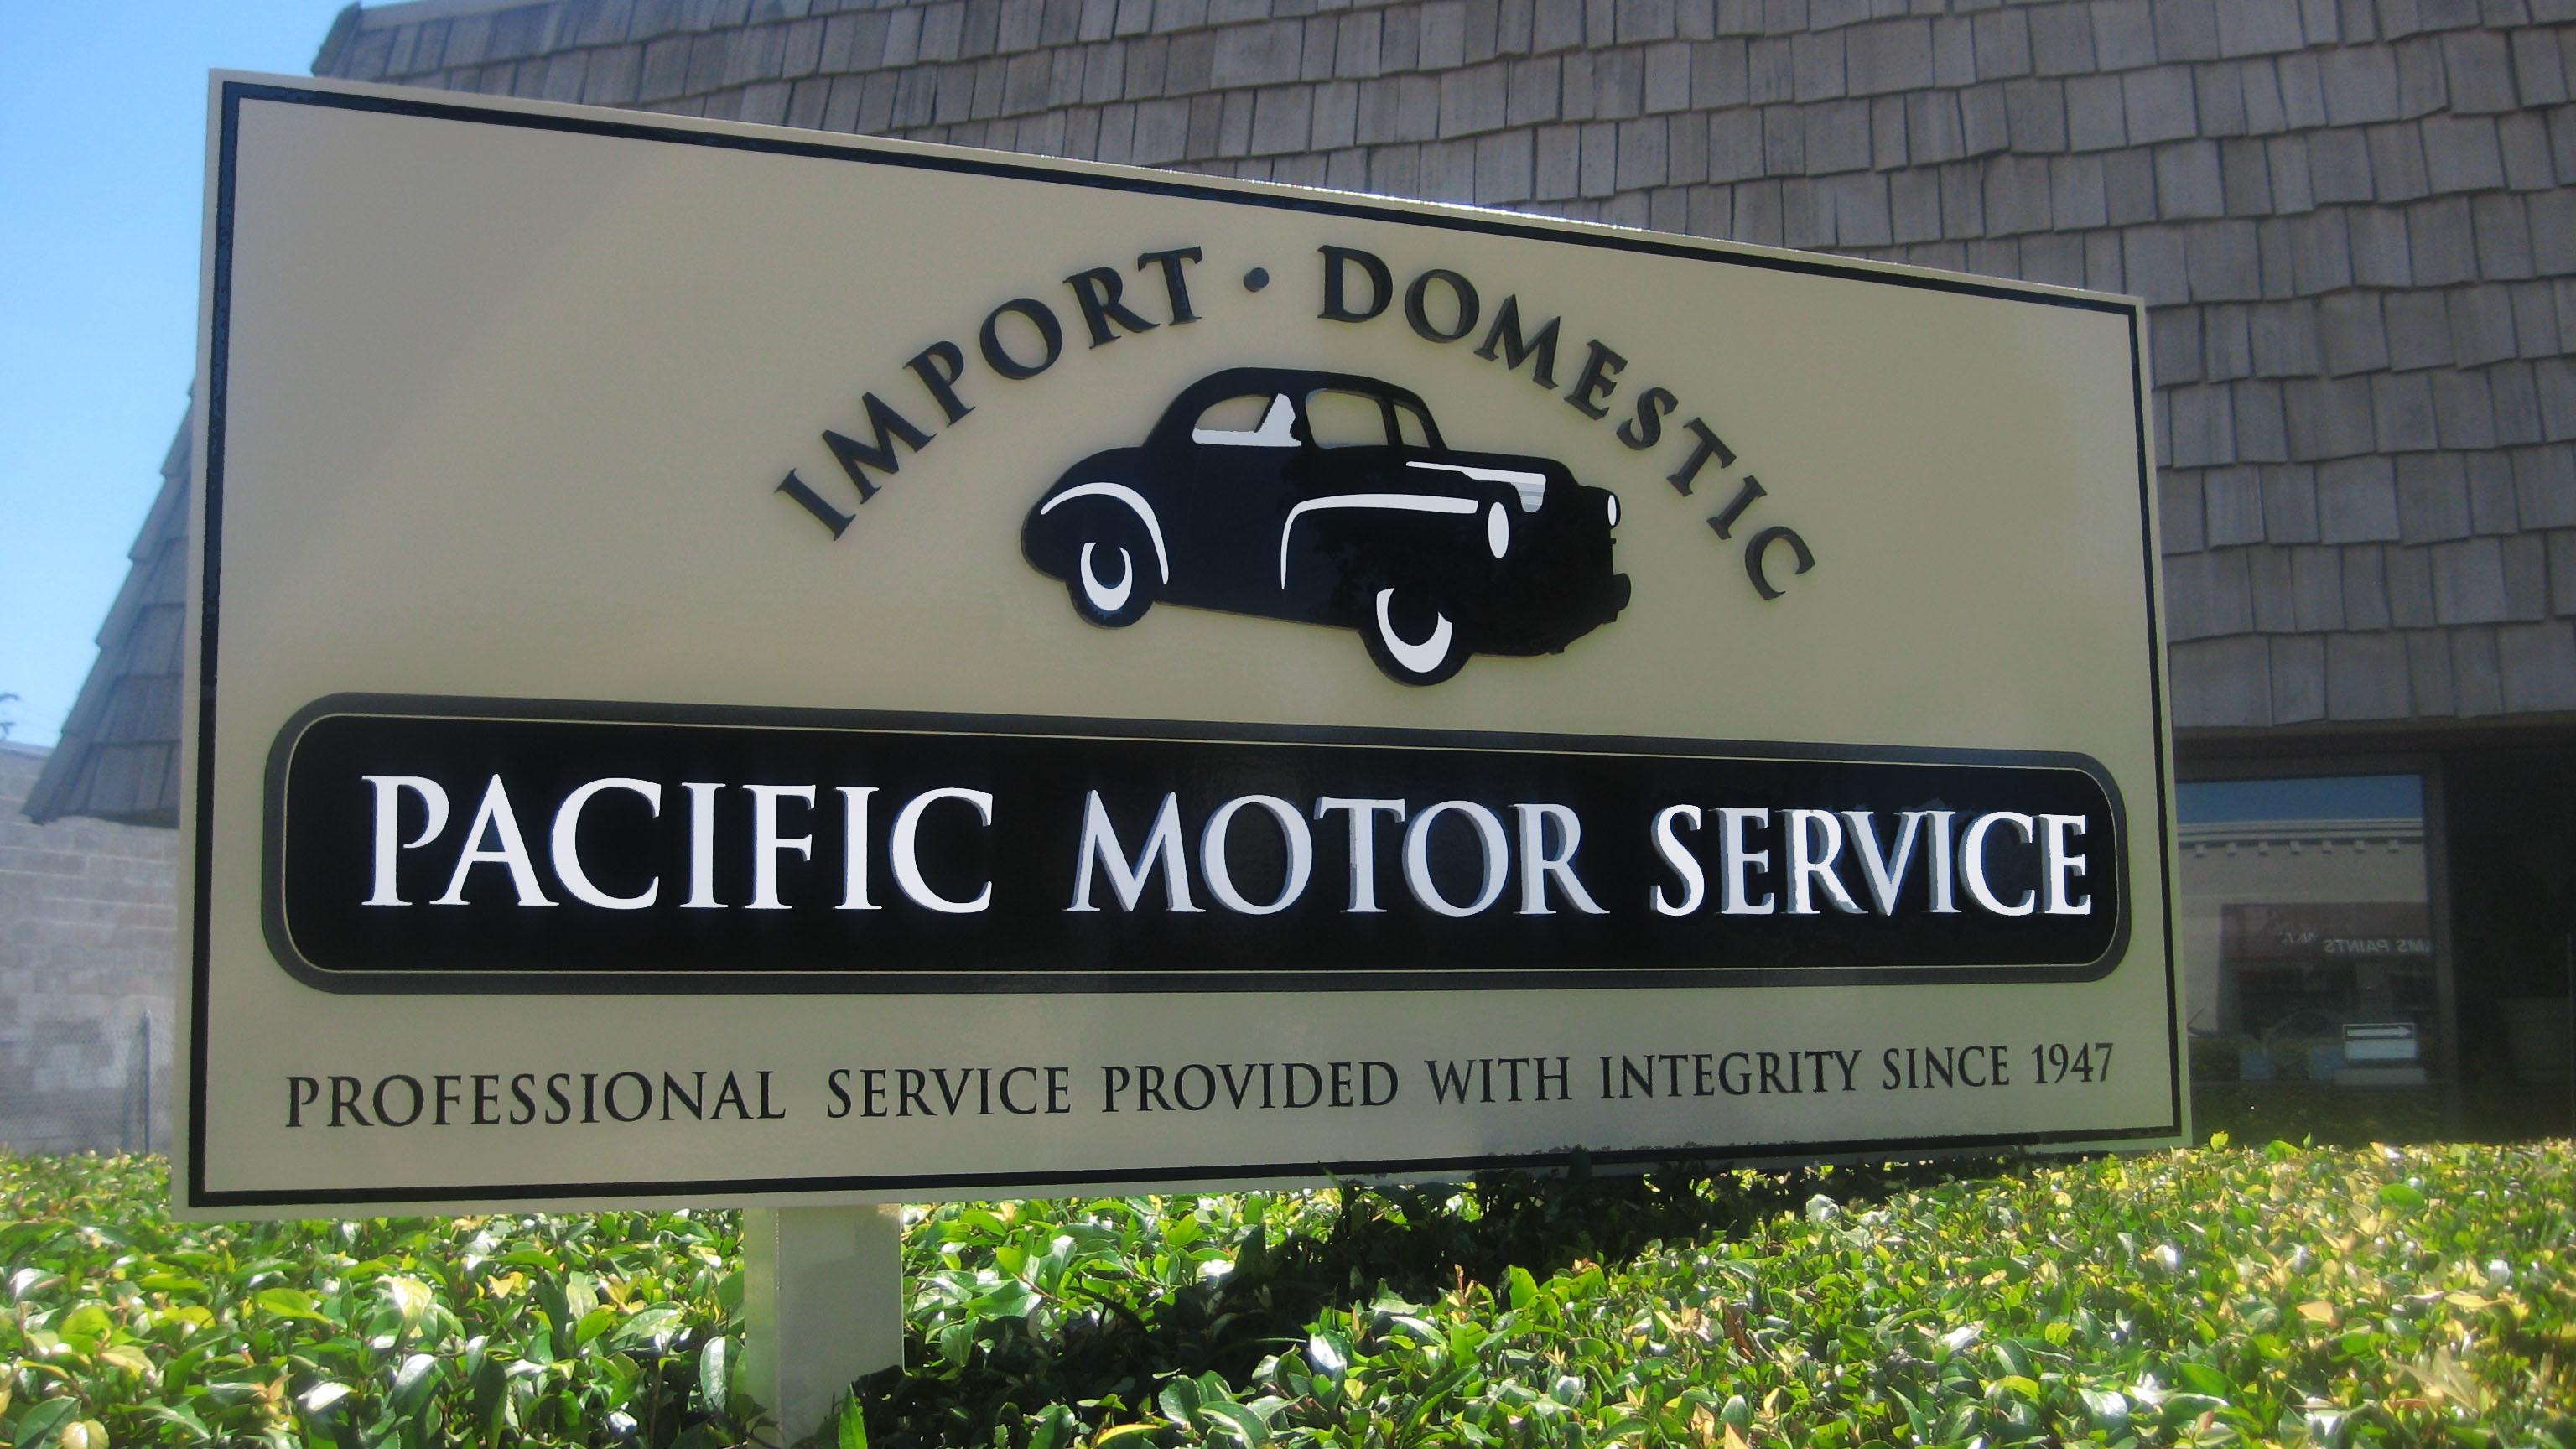 Pacific Motor Service